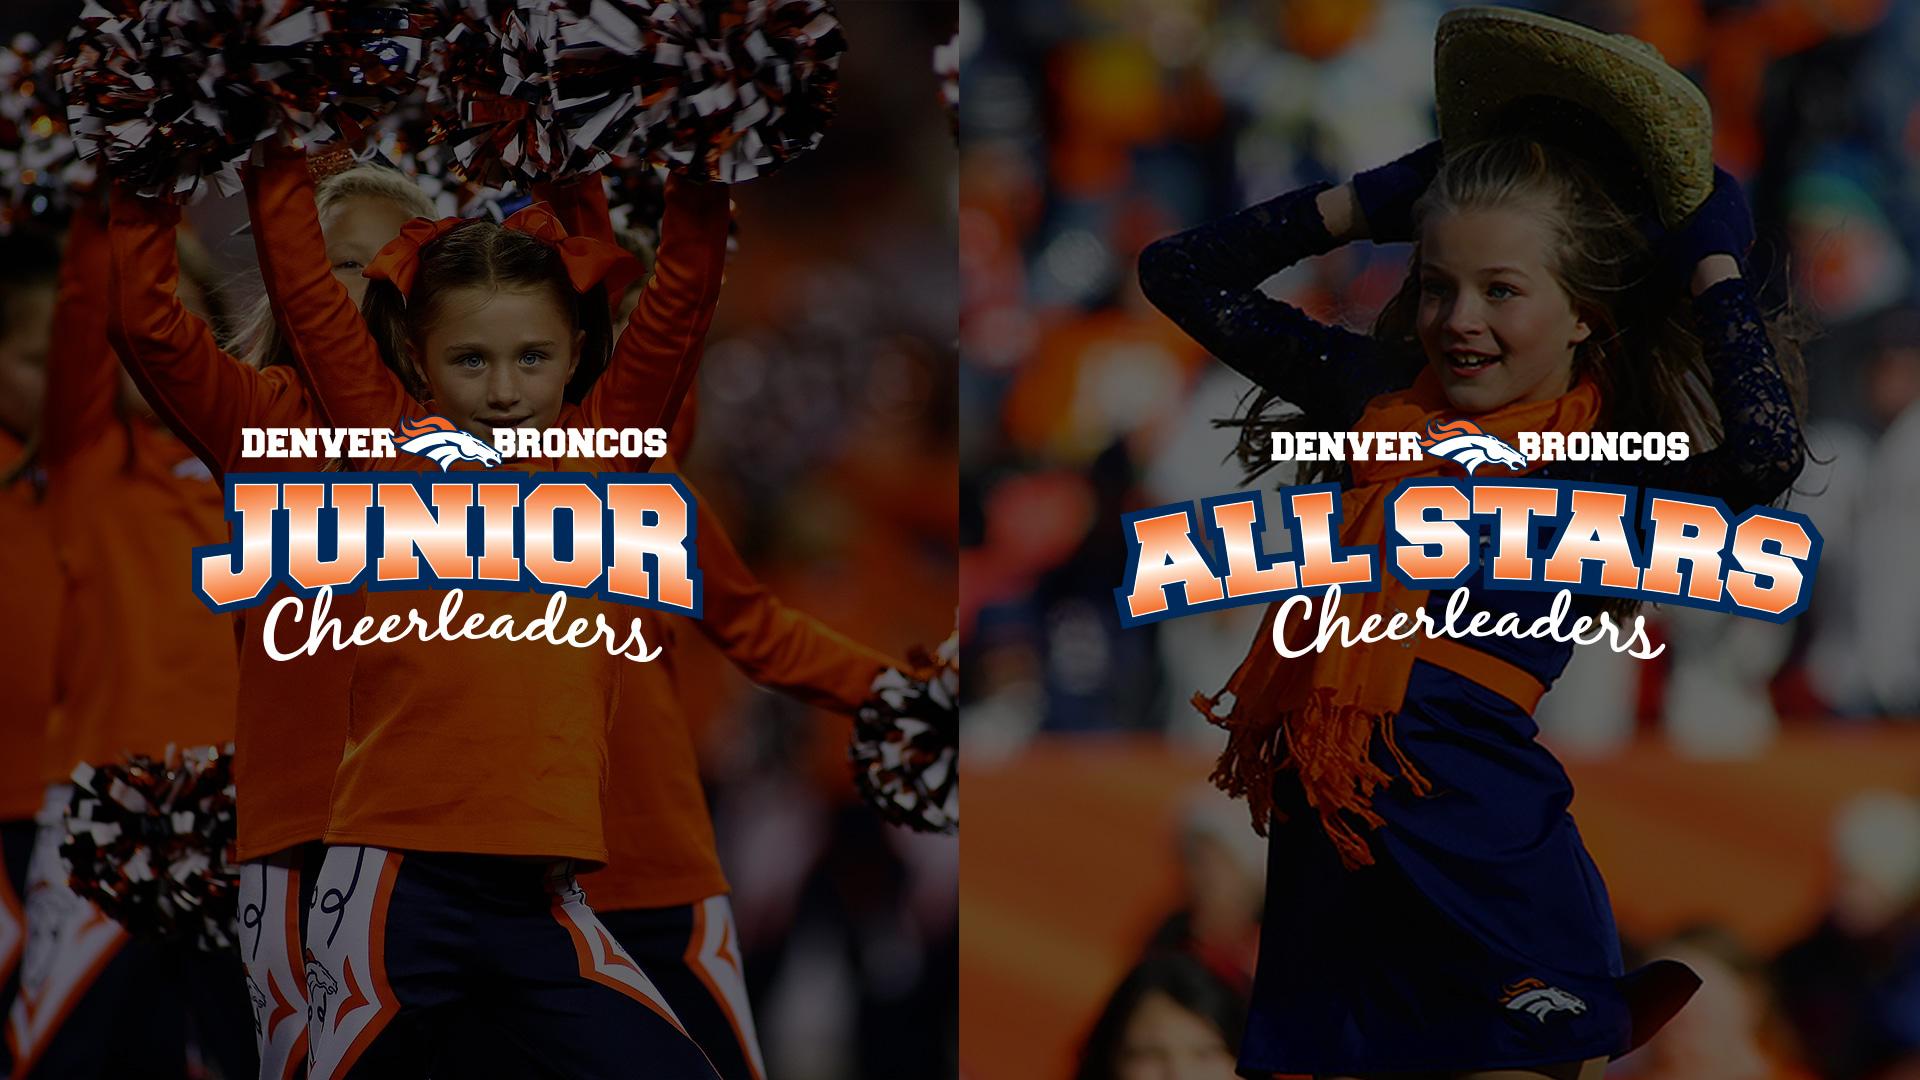 Junior Denver Broncos Cheerleaders and Broncos All Stars